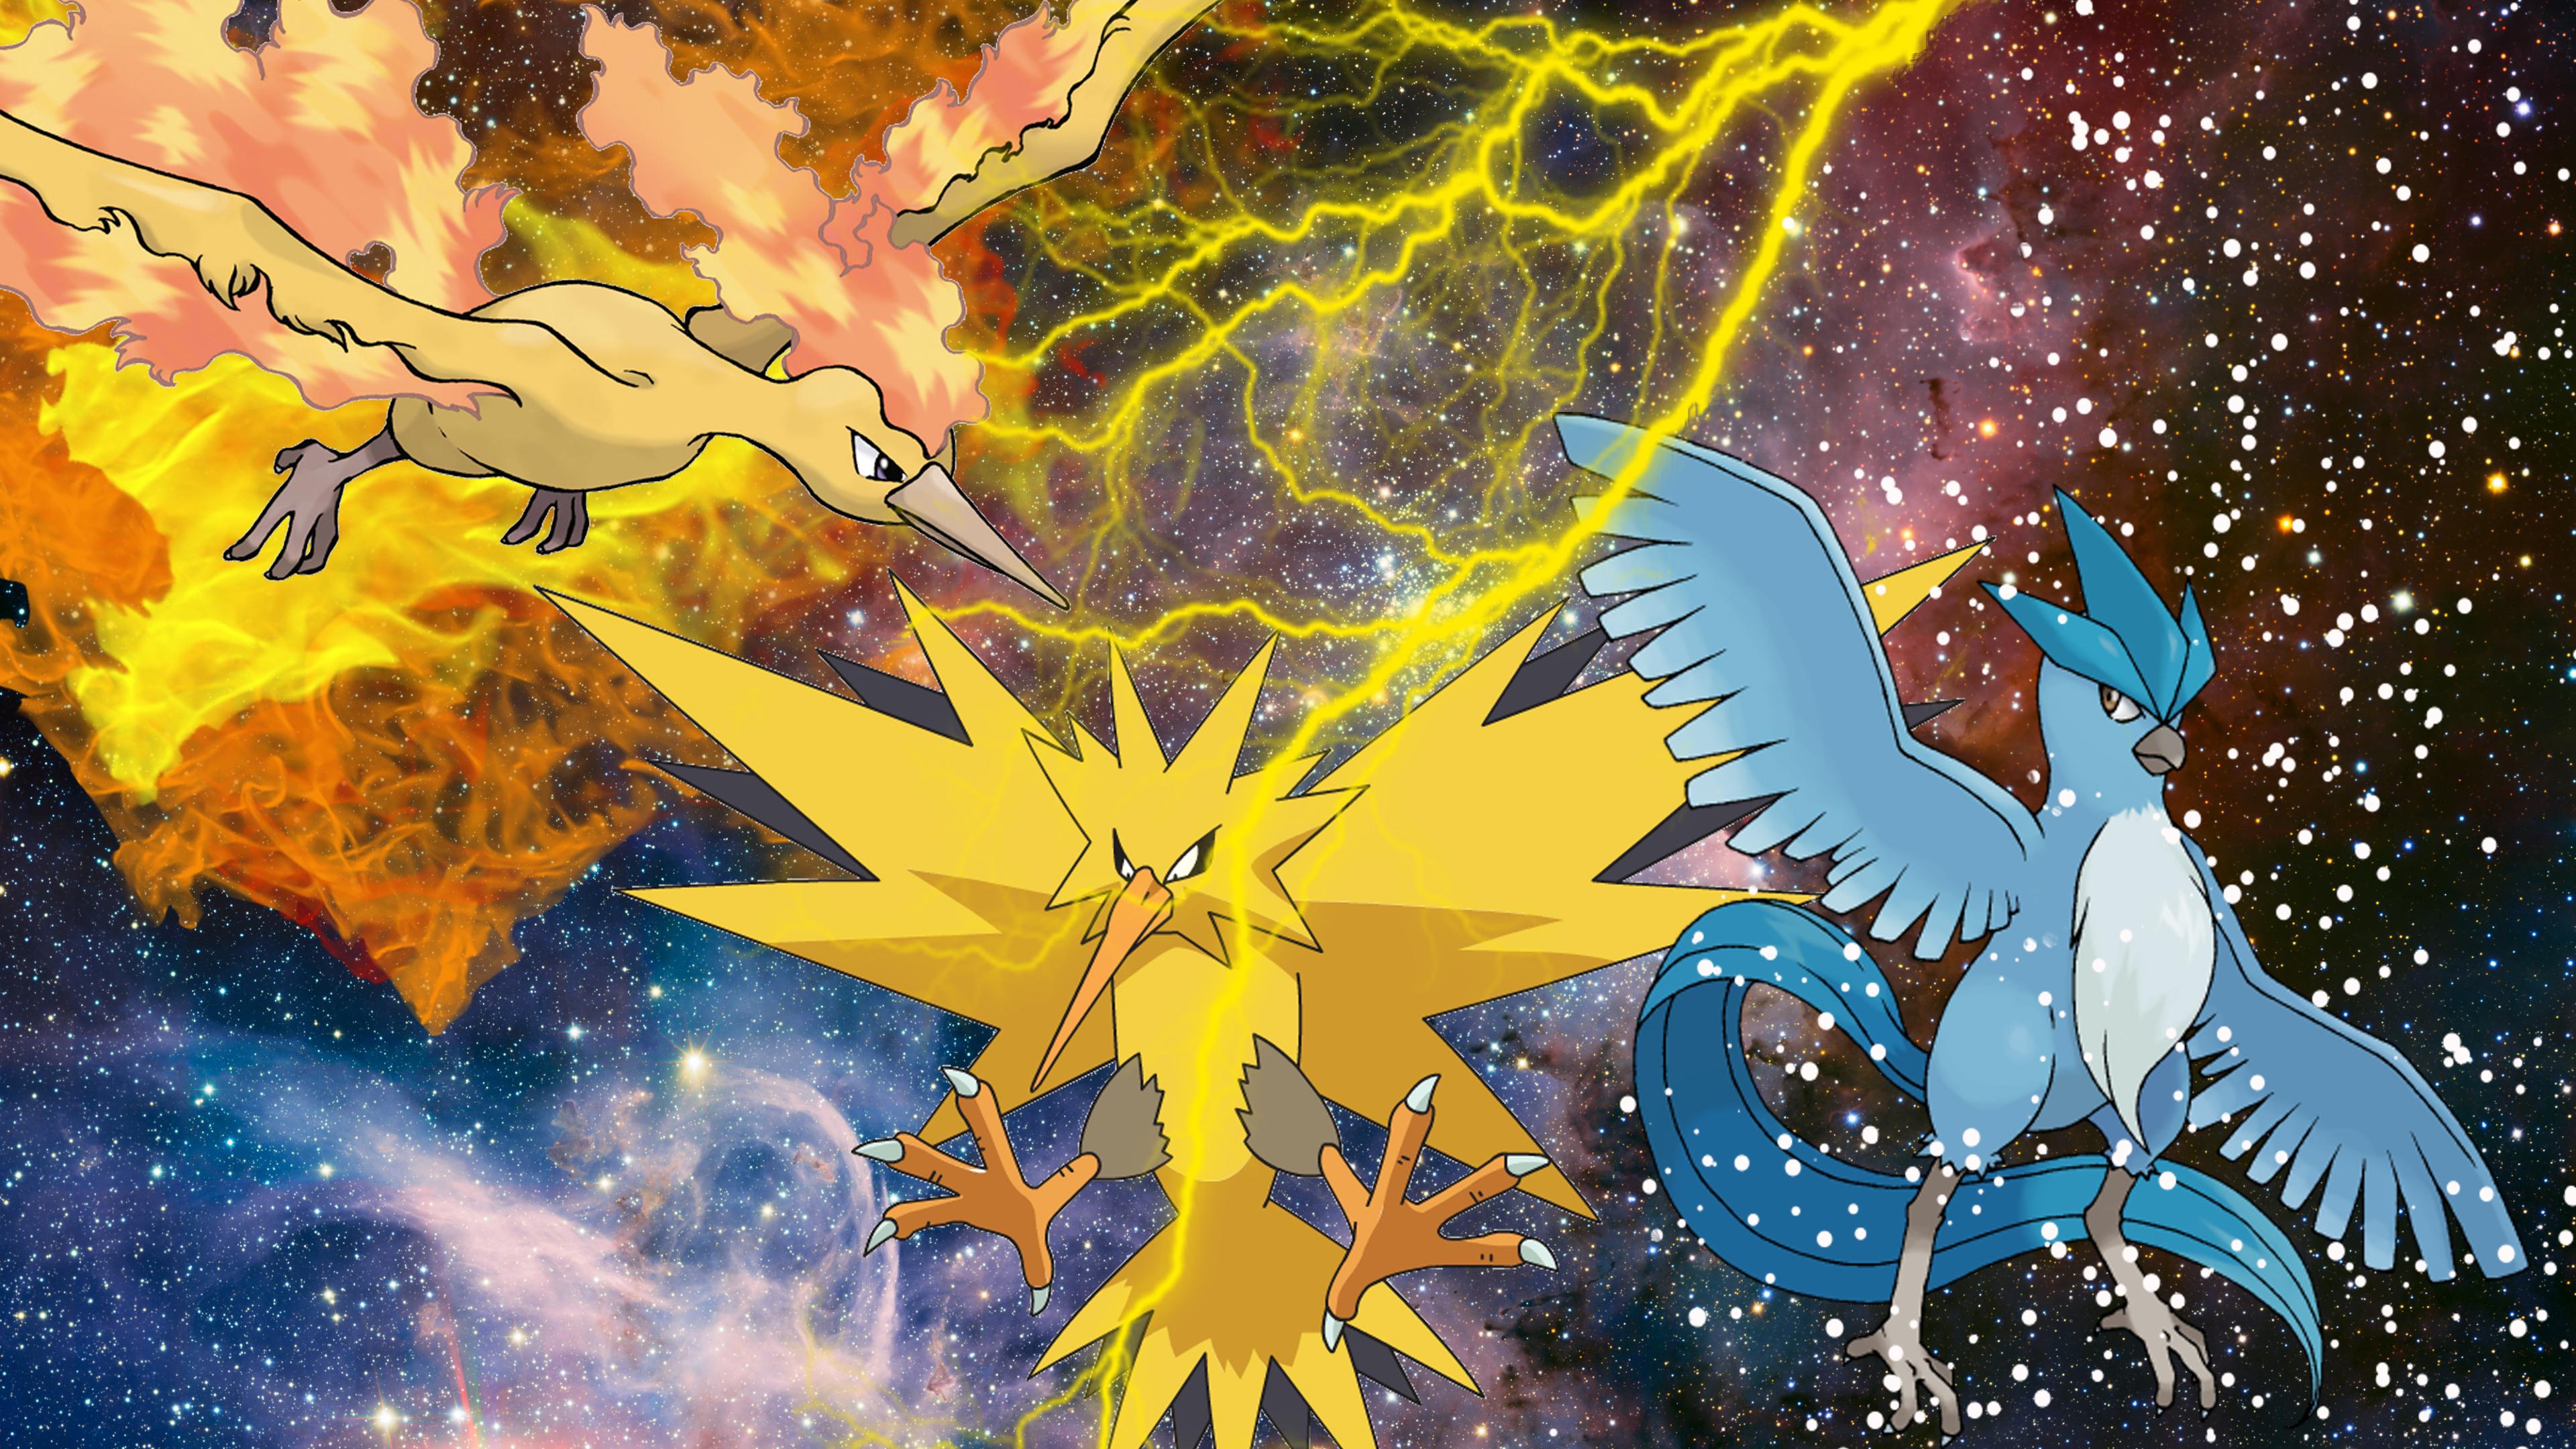 Pokemon Wallpaper Zapdos Moltres Articuno 3840x2160 Download Hd Wallpaper Wallpapertip